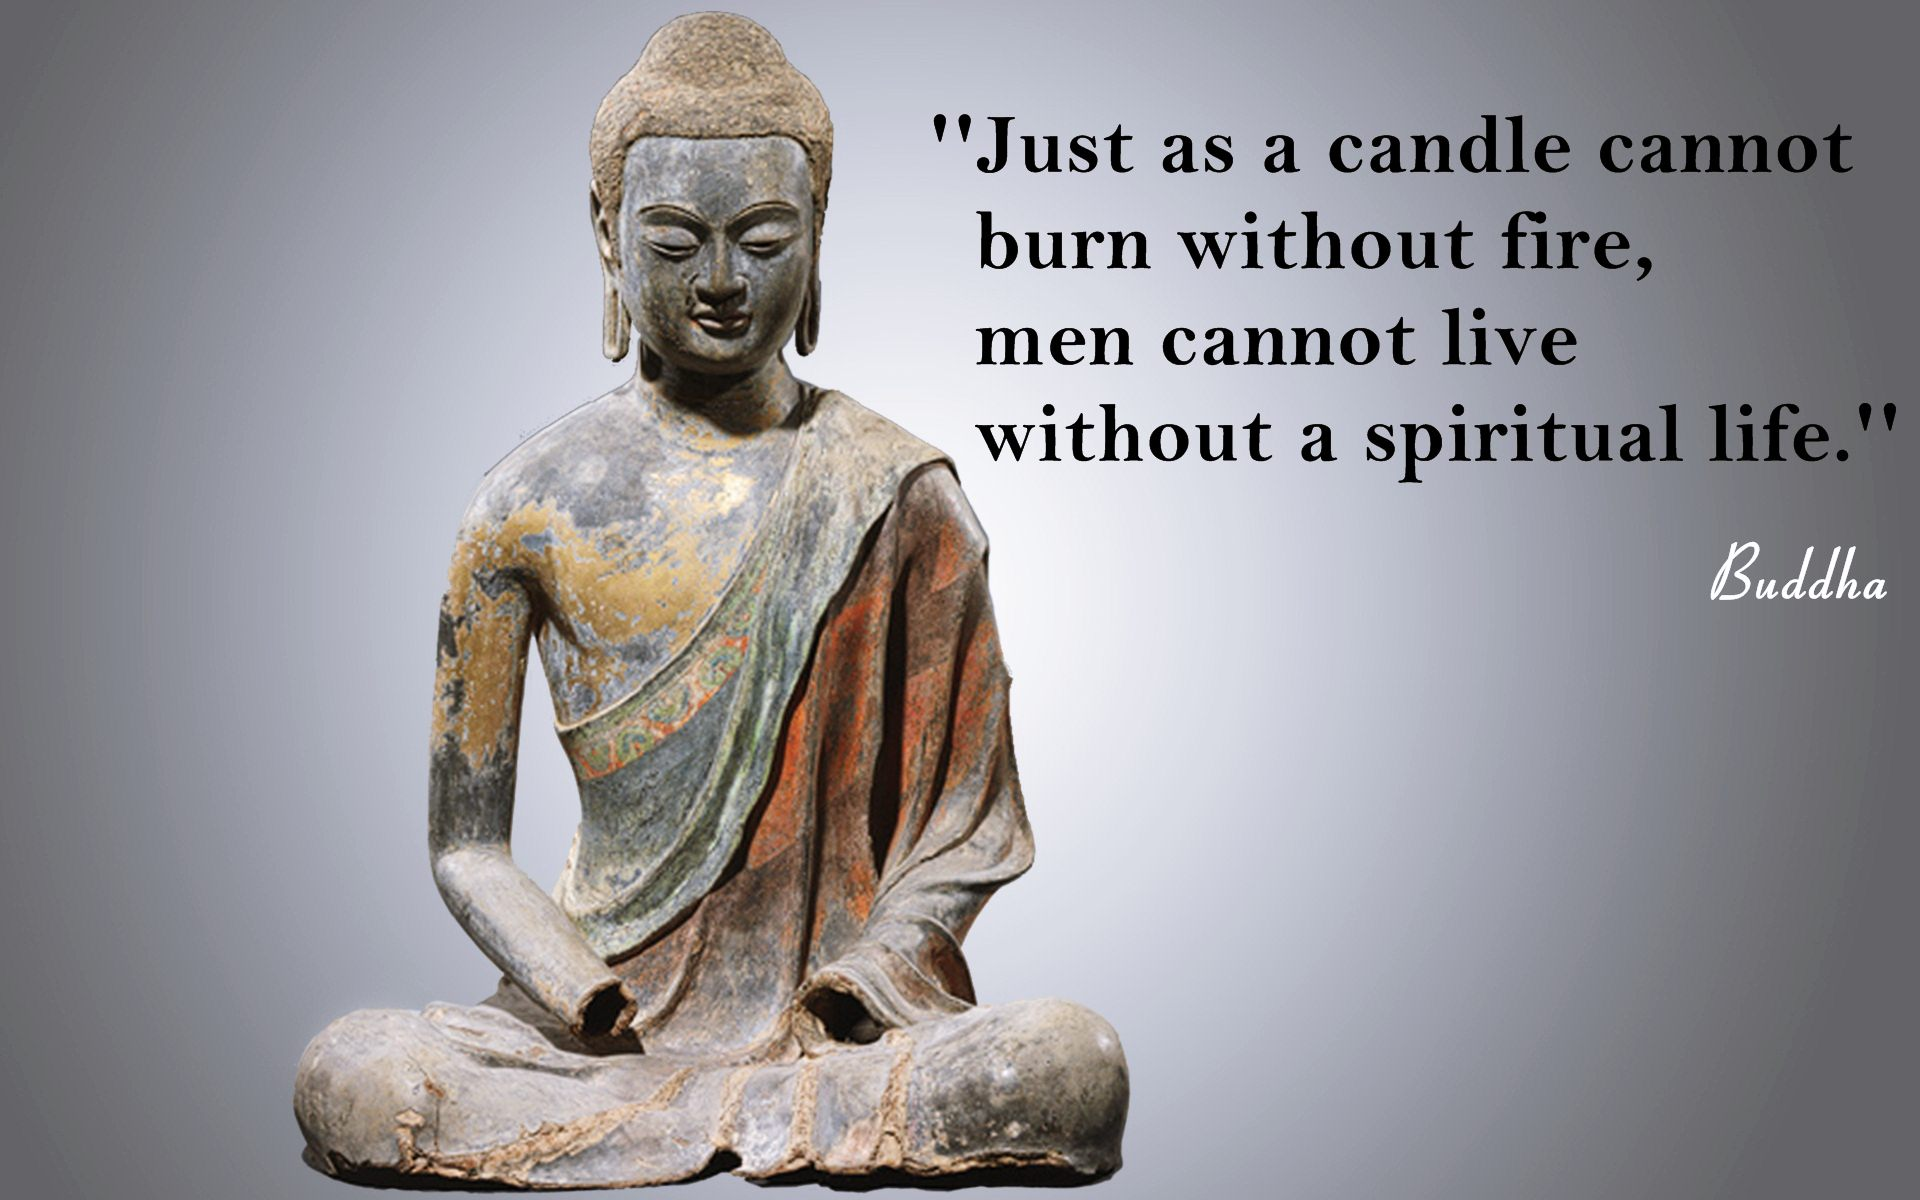 Buddha Spiritual Life Quotes Wallpaper 05665 - Baltana